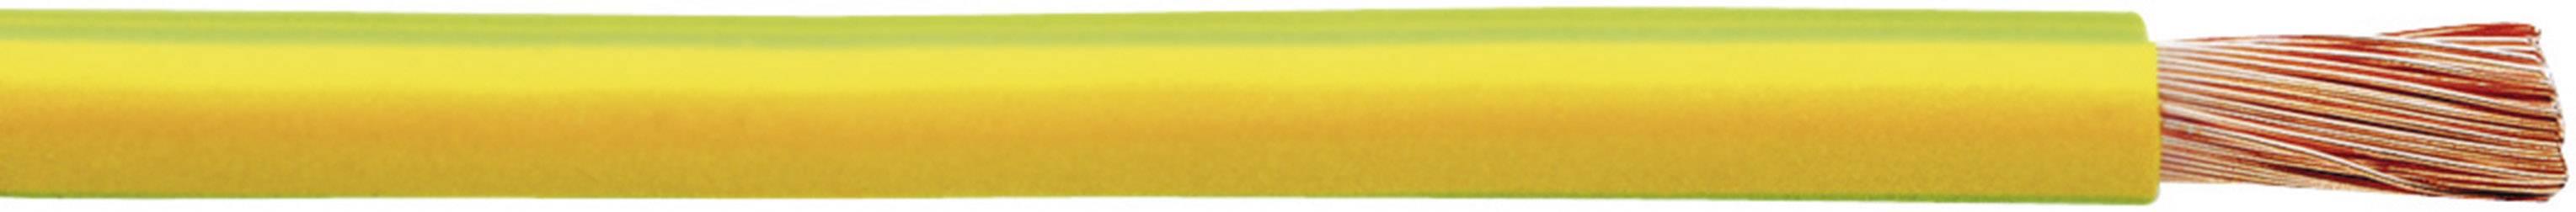 Opletenie / lanko Faber Kabel 040231 H07V-K, 1 x 6 mm², vonkajší Ø 4.50 mm, metrový tovar, tmavomodrá